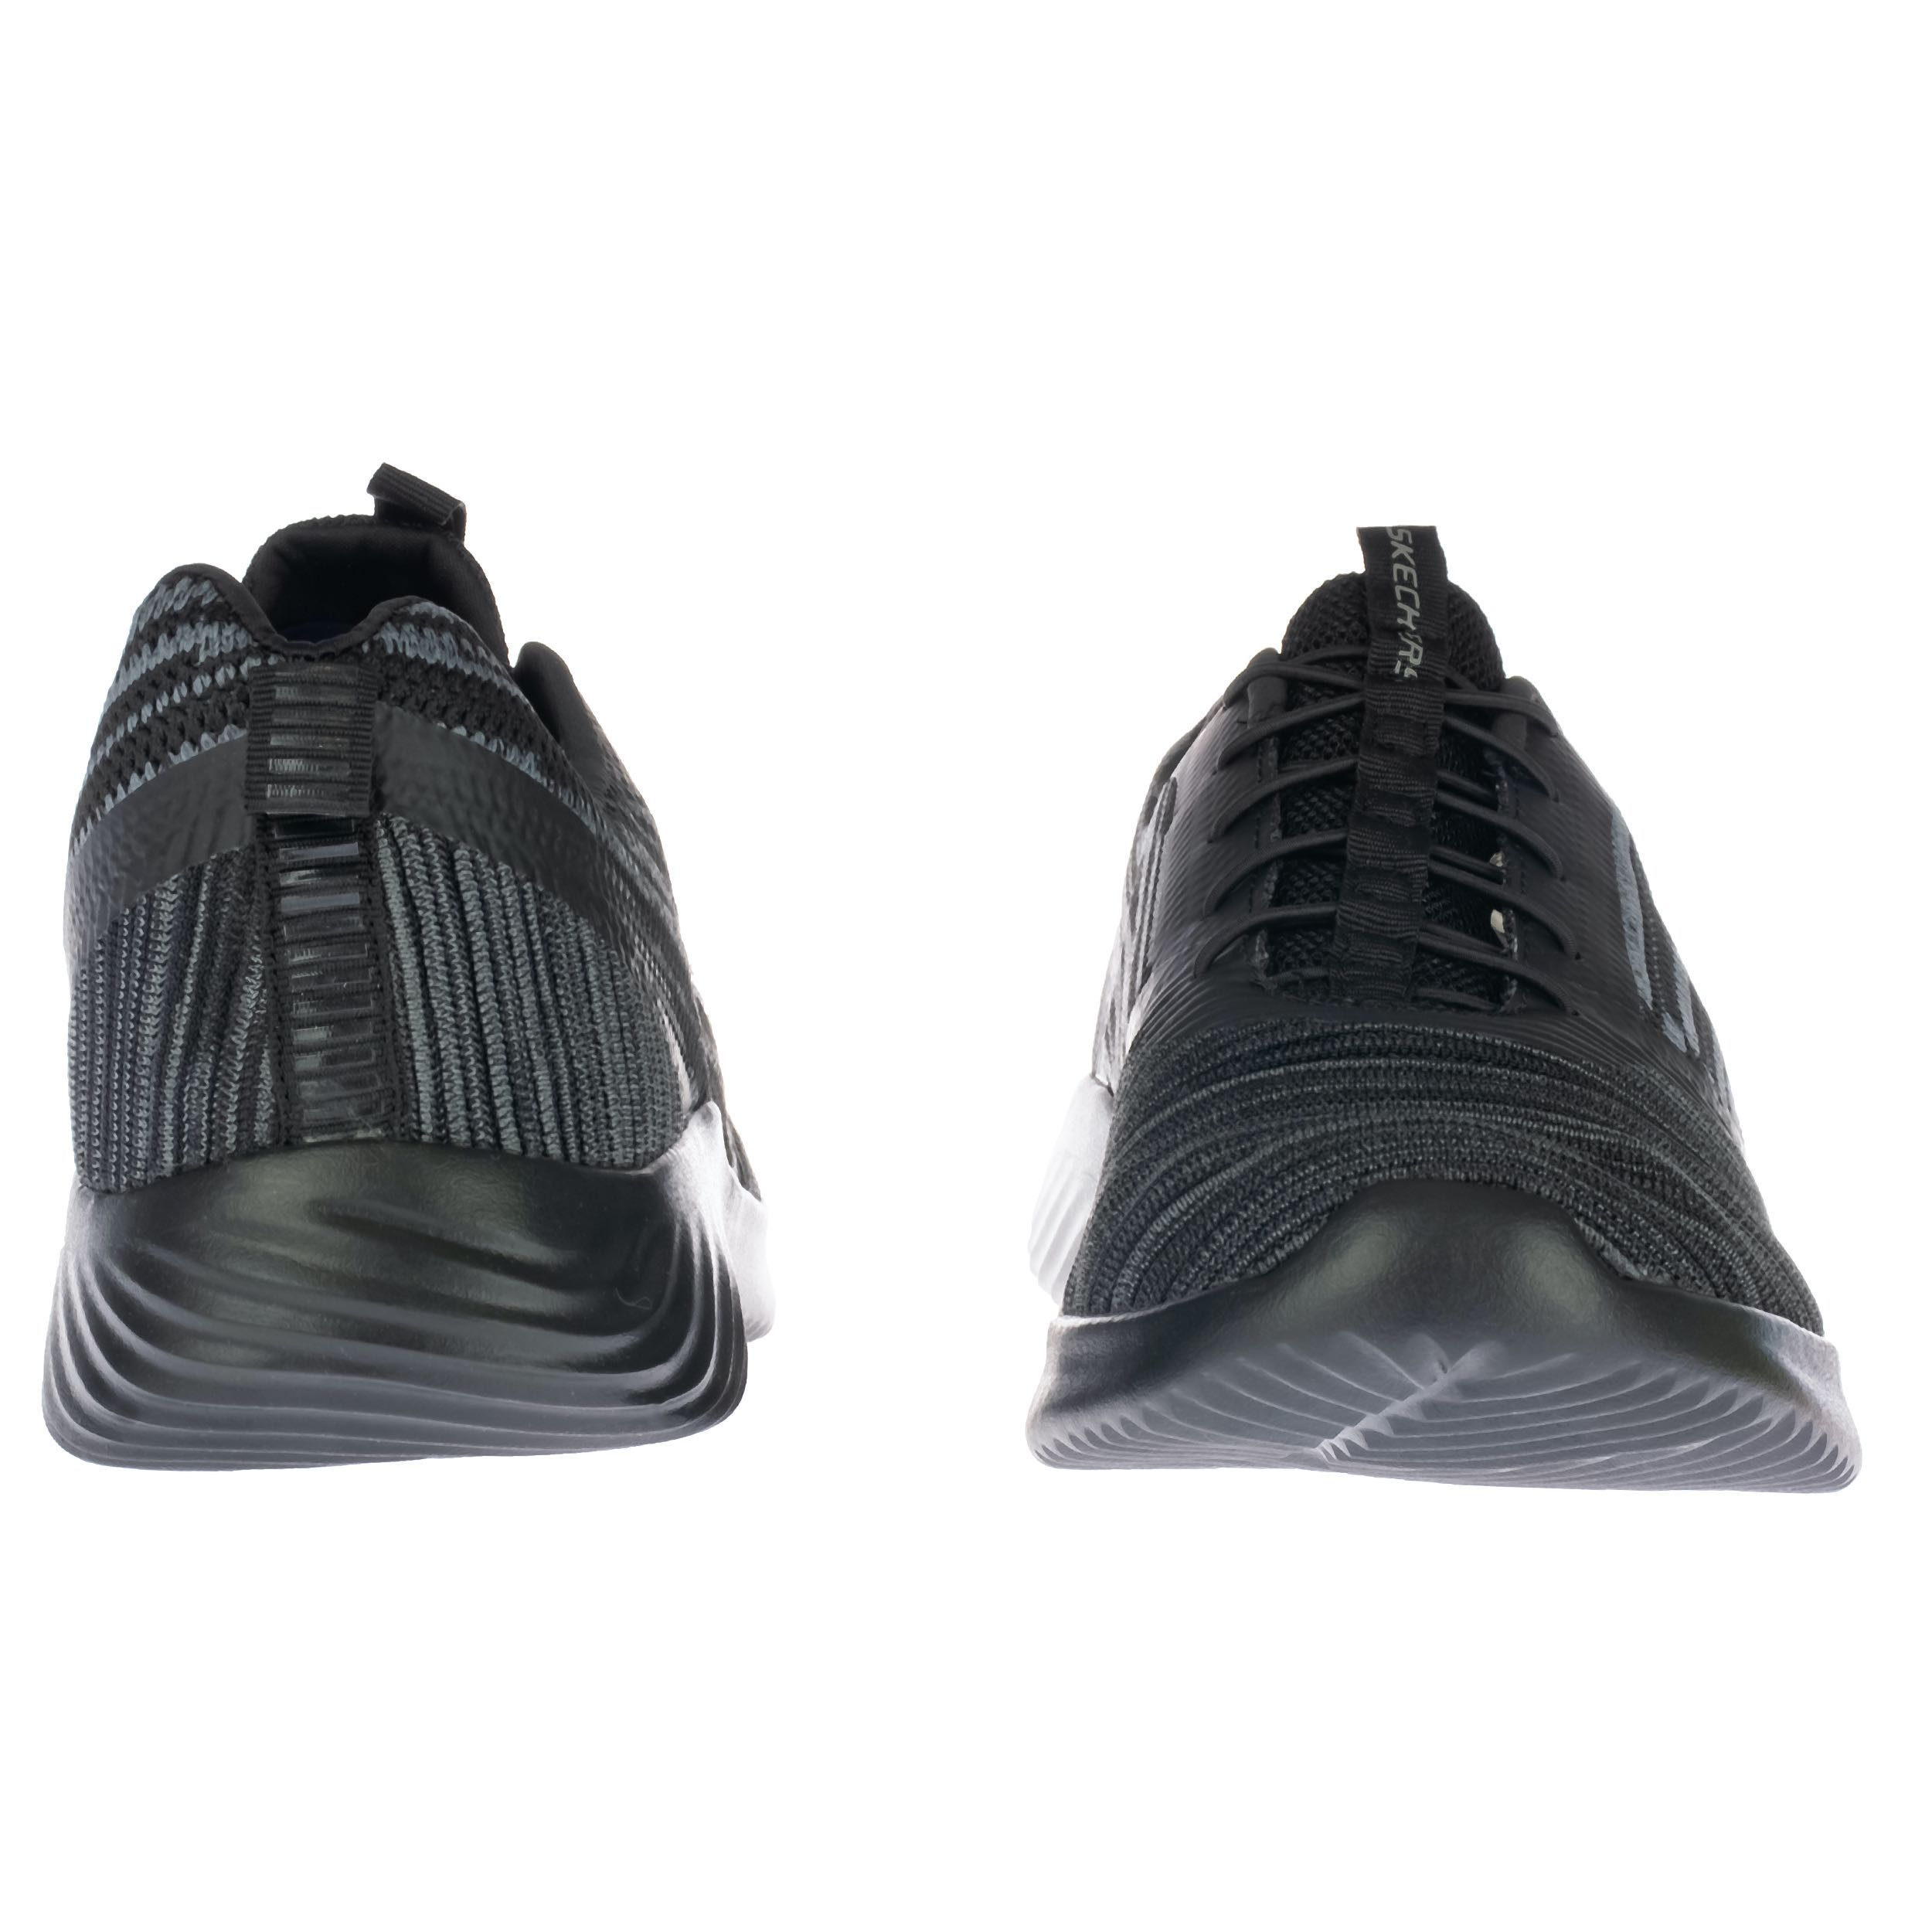 خرید                      کفش  پیاده روی مردانه کد D17